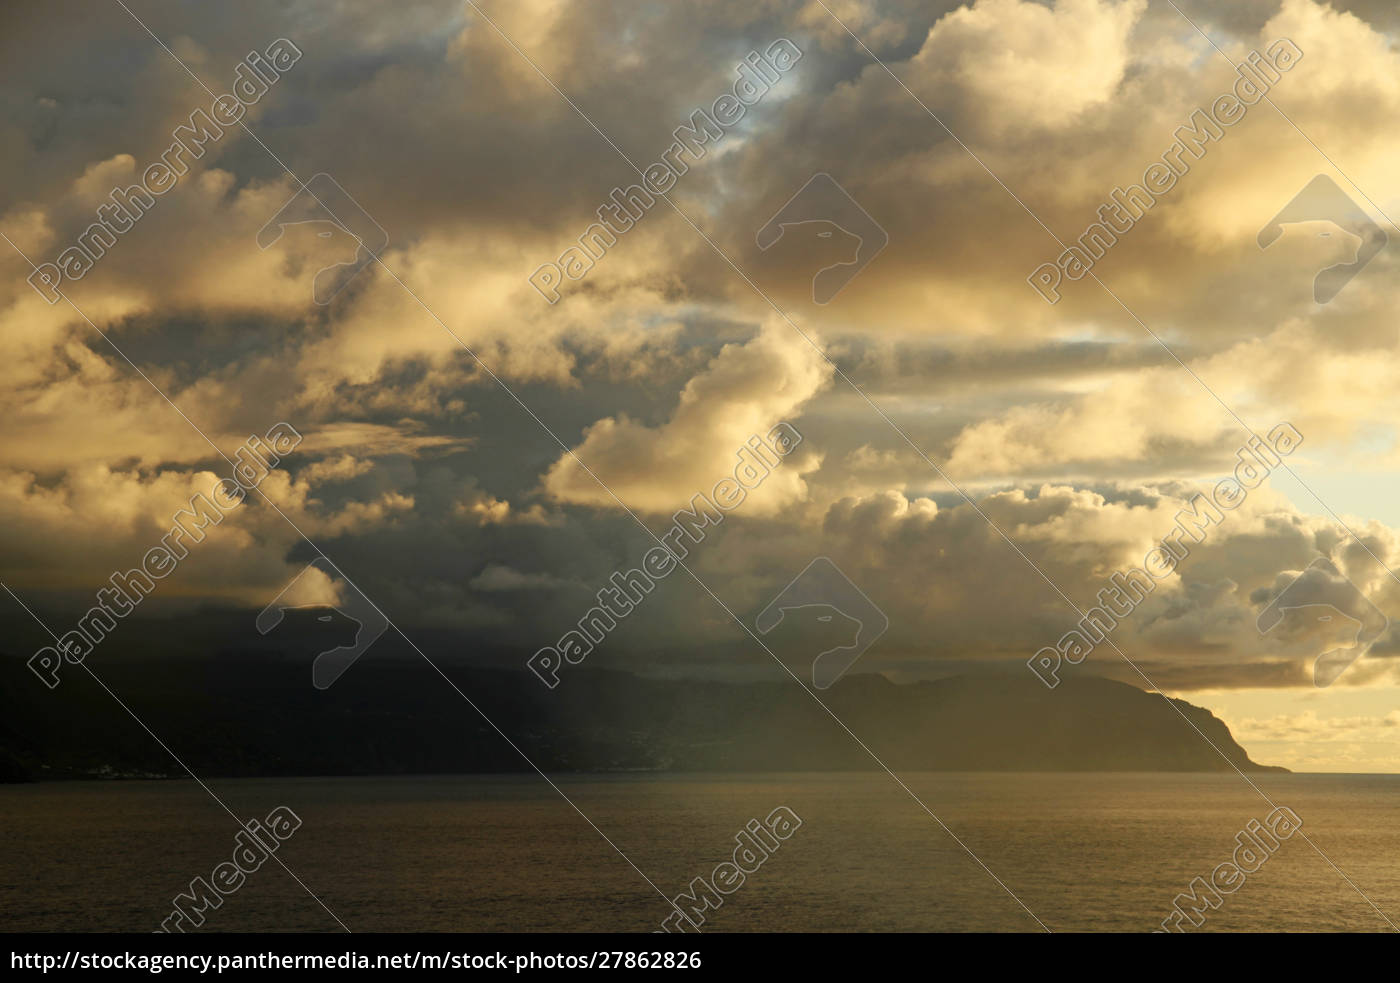 portugalia, azory., wschód, słońca, i, chmury, nad - 27862826